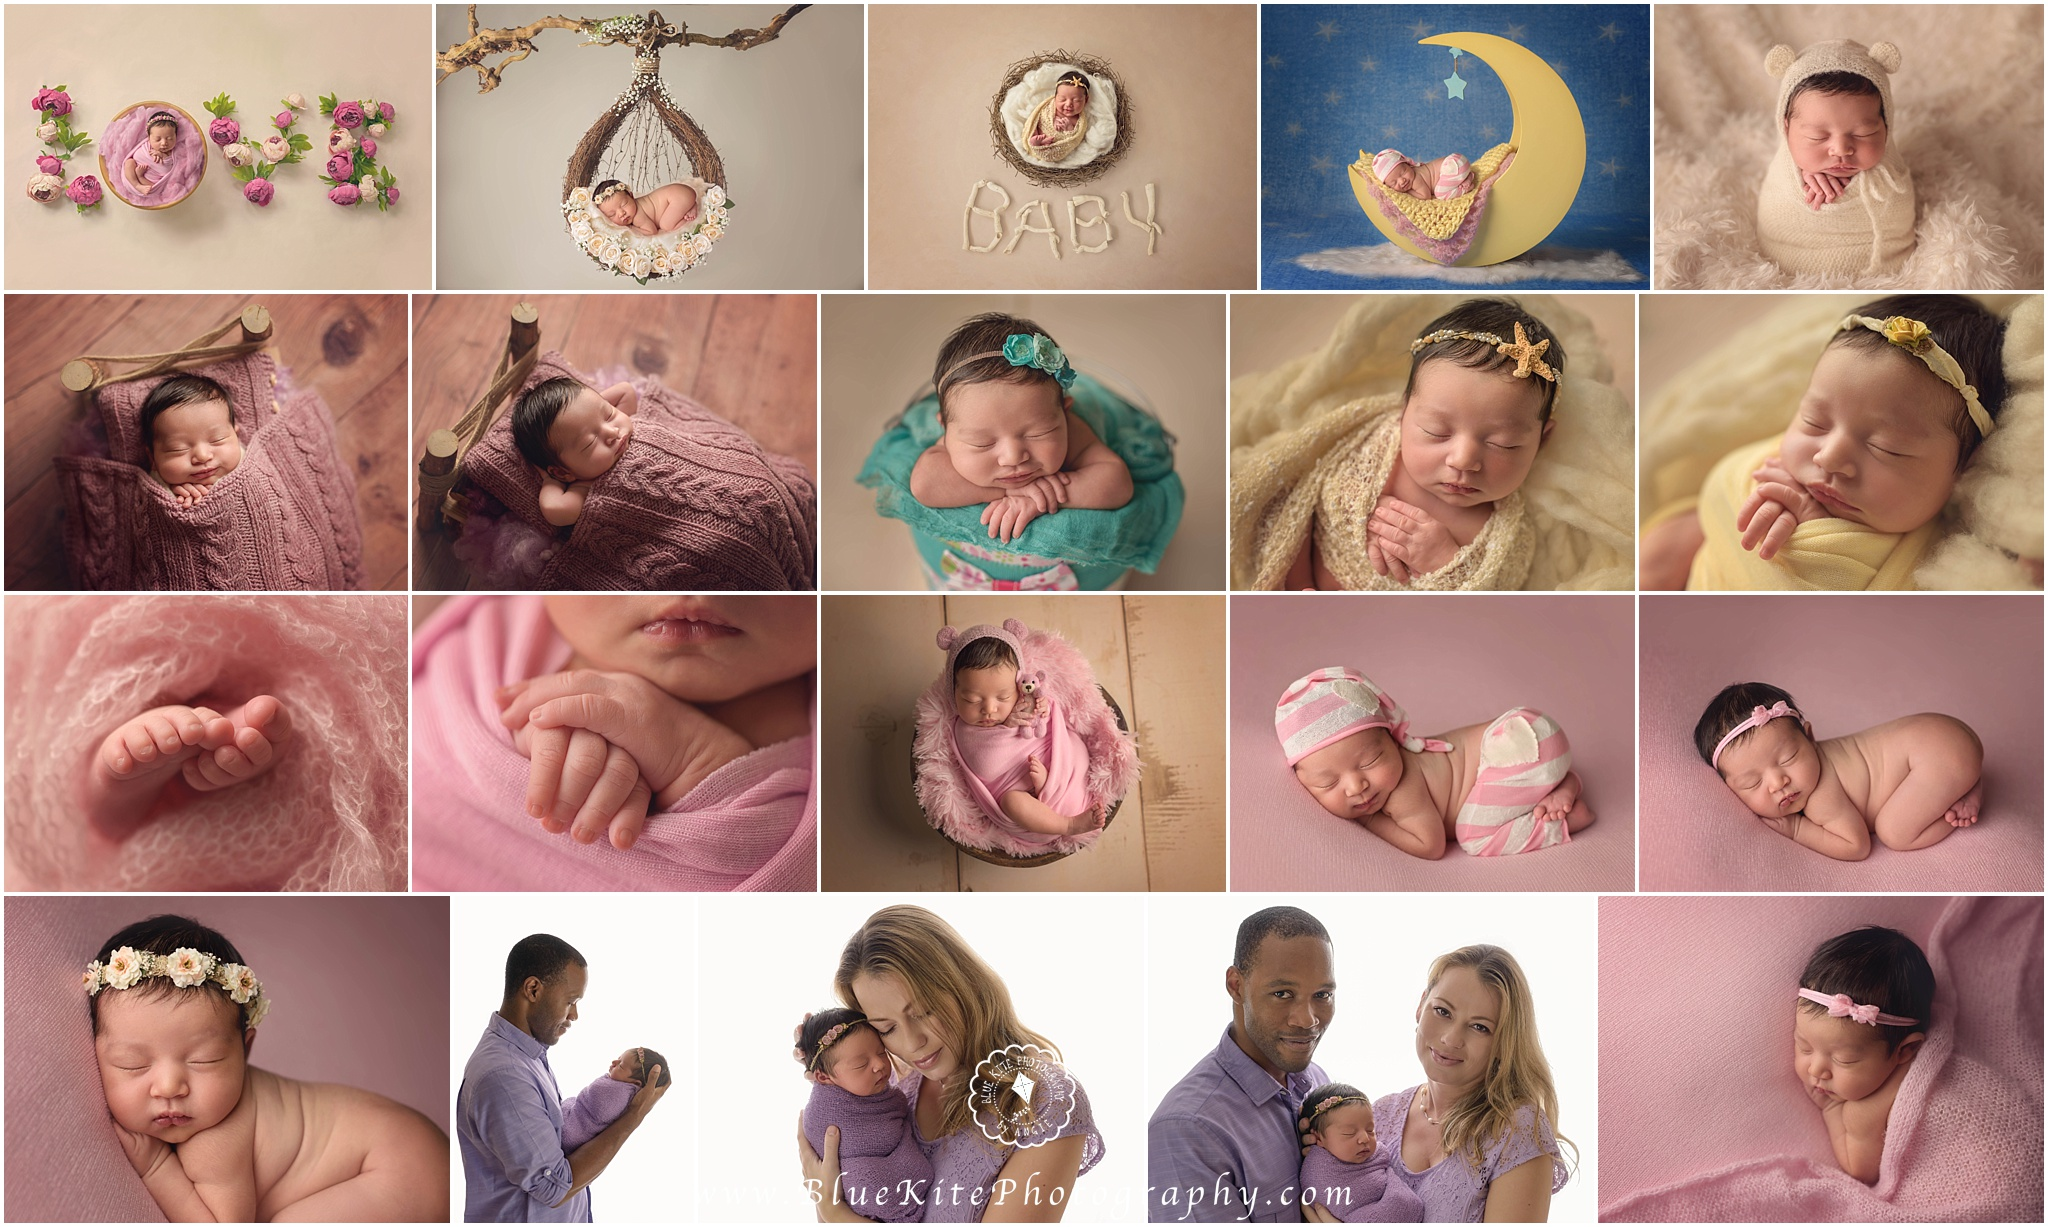 Newborn Photographer Boca raton, Coral Springs, Boynton beach, Parkland, Deerfield, Delray, Palm Beach, Lake Worth, Weston, Coconut Creek, Plantation, Ft Lauderdale